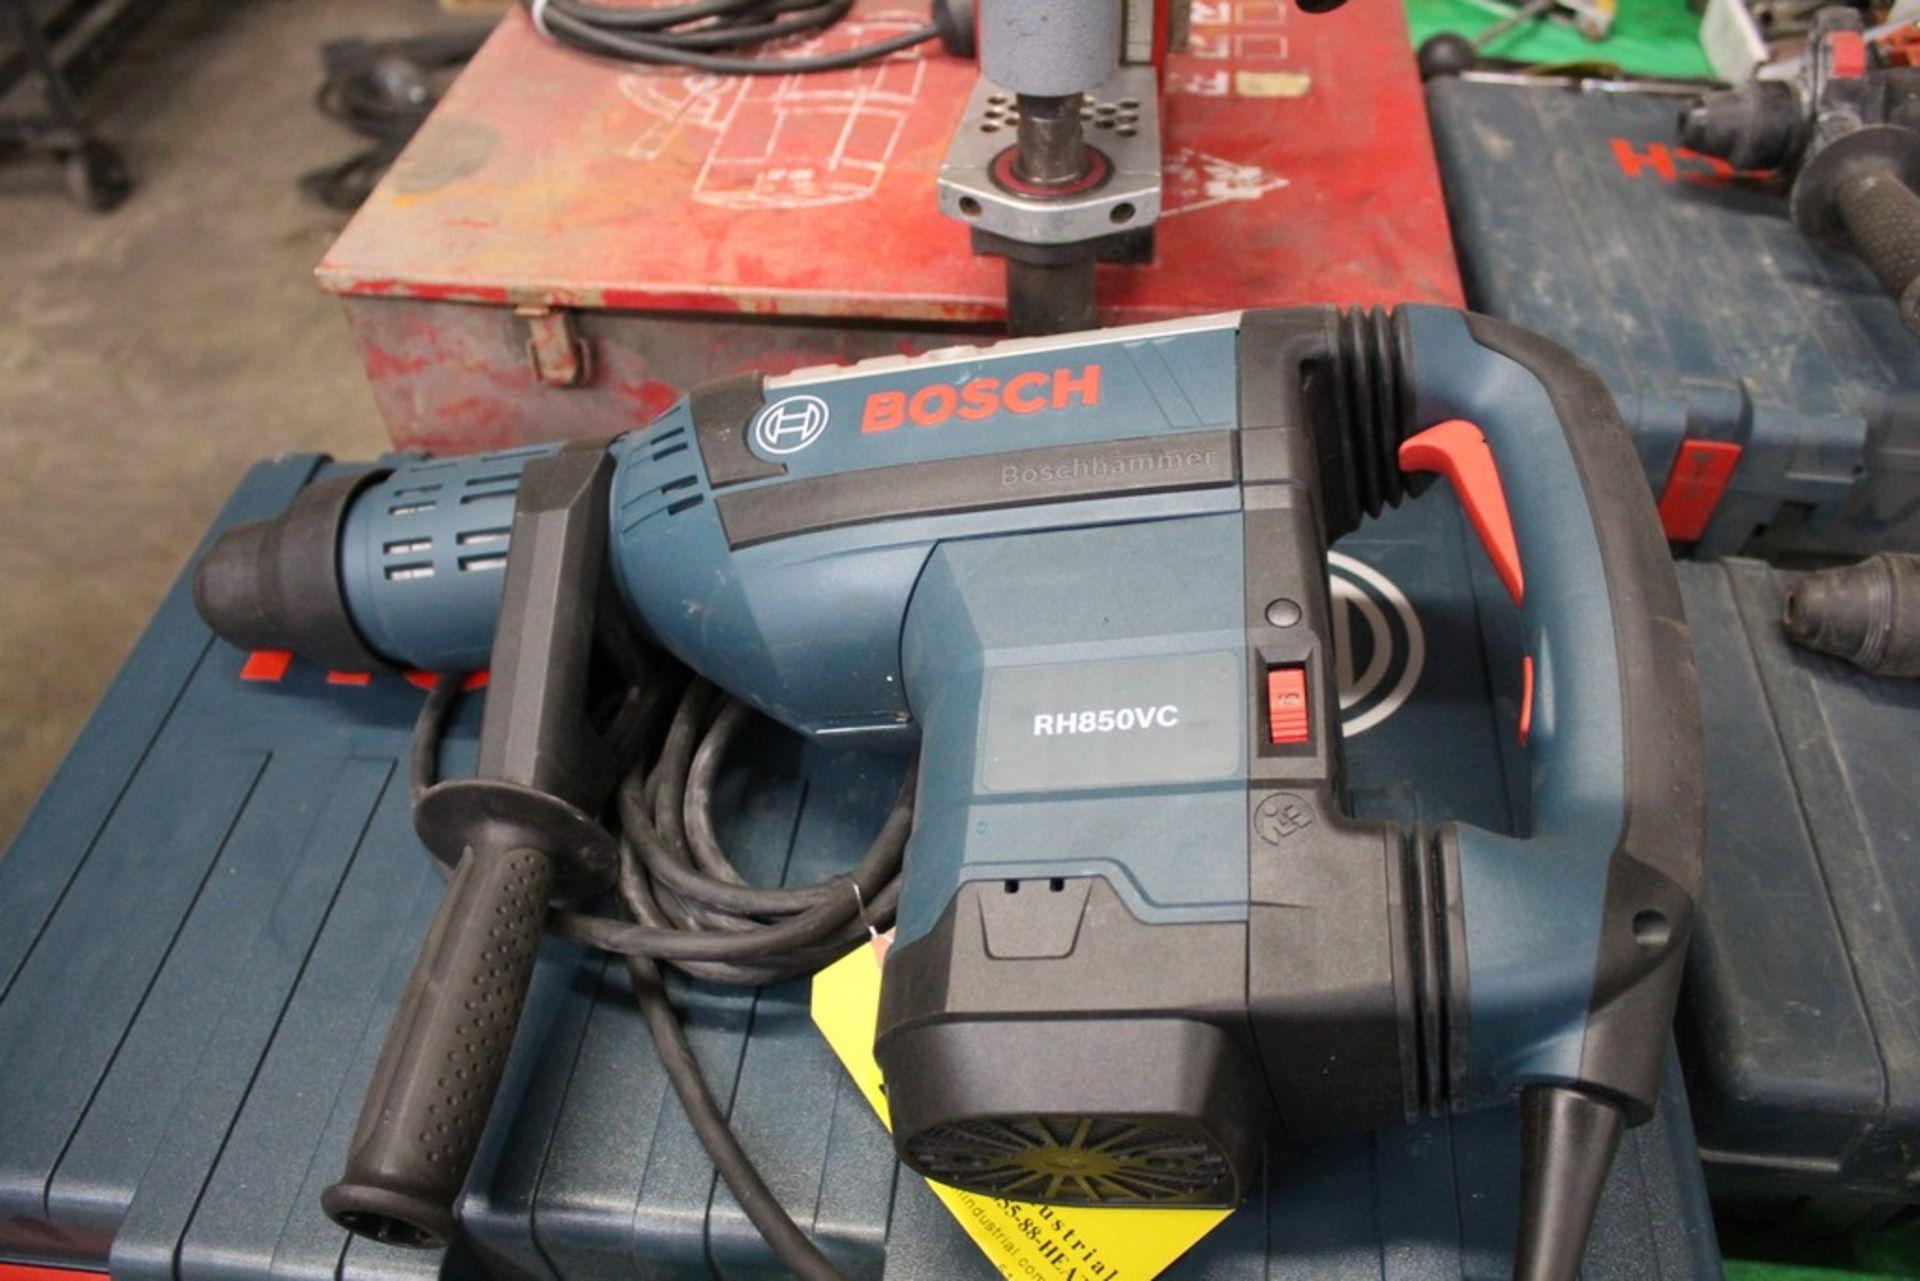 Lot 2 - BOSCH MODEL RH850VC ROTARY HAMMER